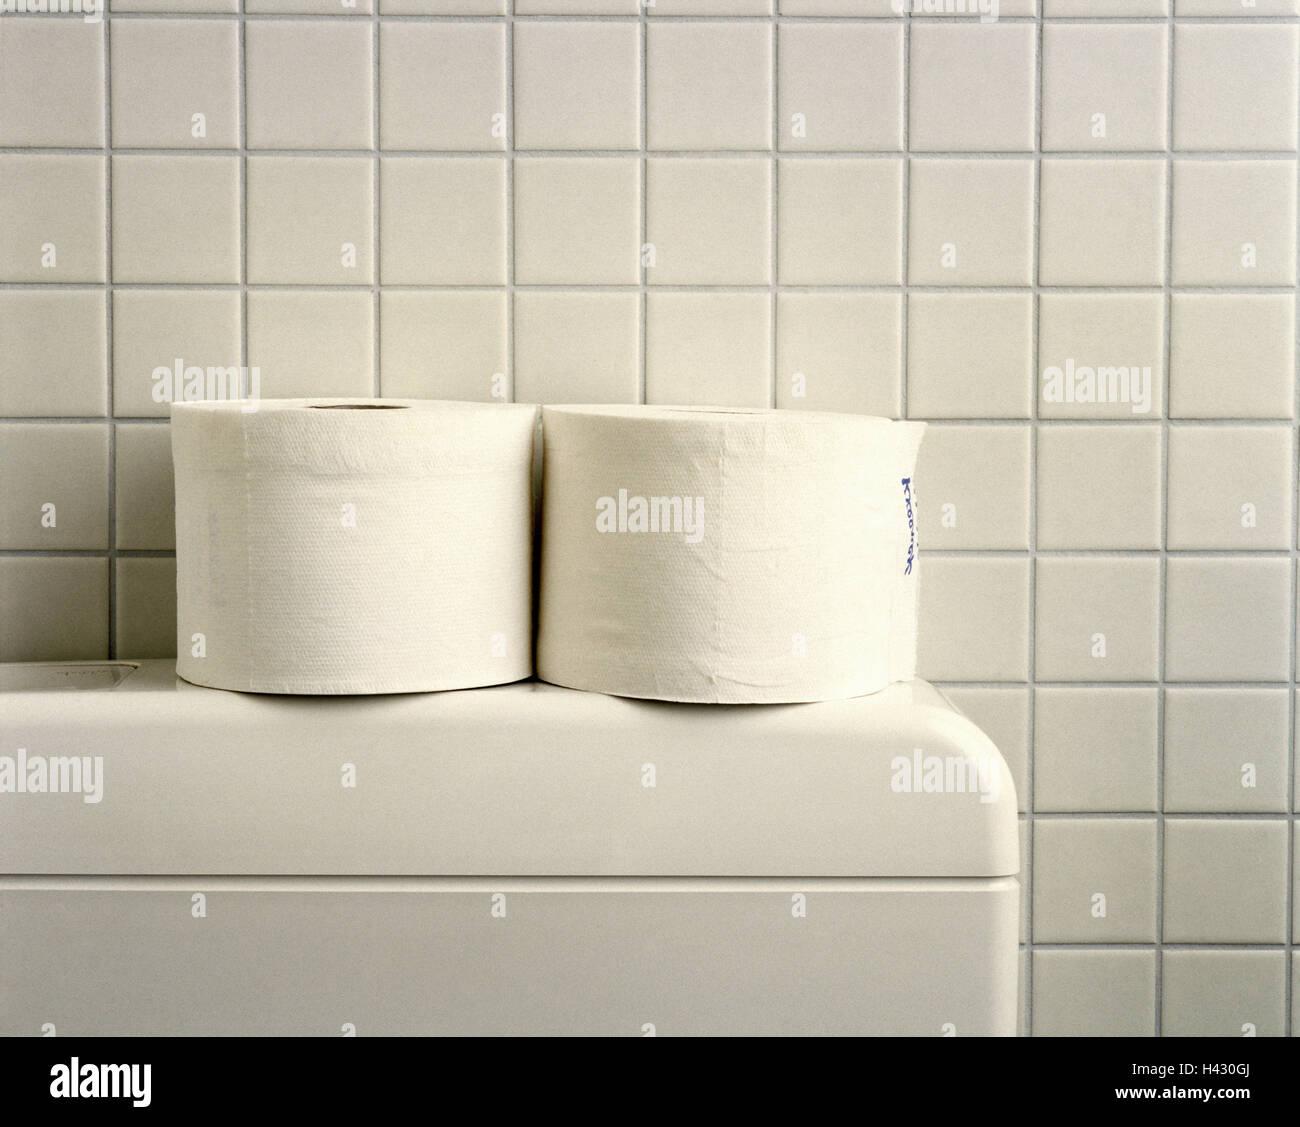 Wc Spulkasten Detail Toilettenpapier Konzeption Bad Badezimmer